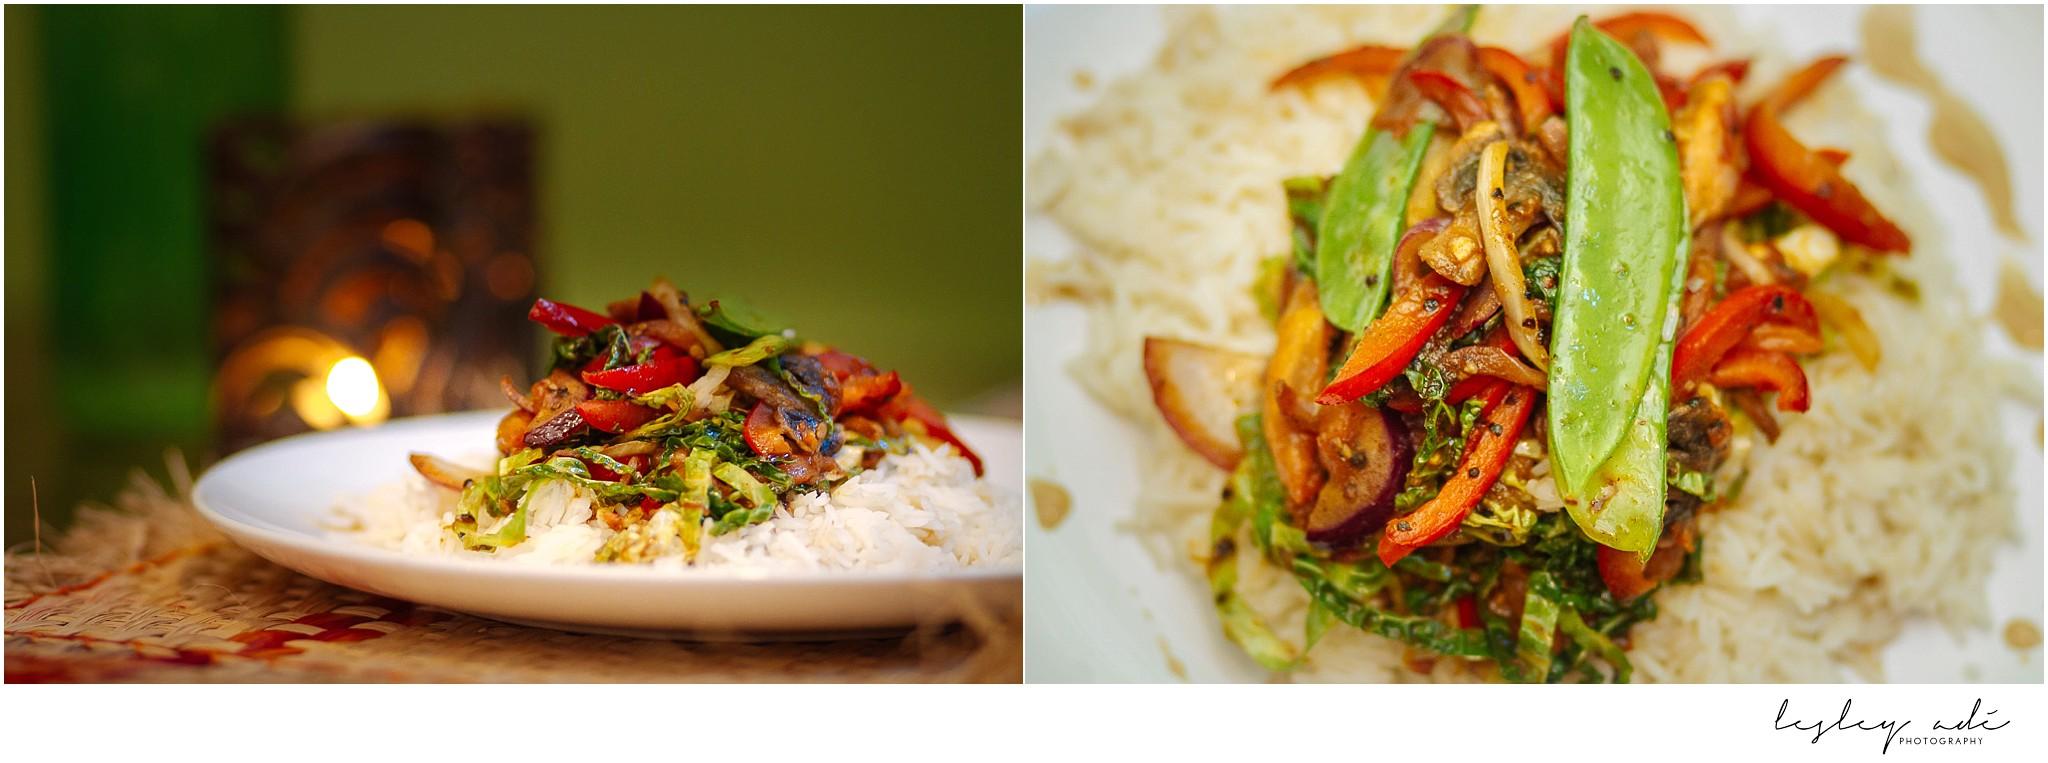 vegan creole stir fry-1.jpg